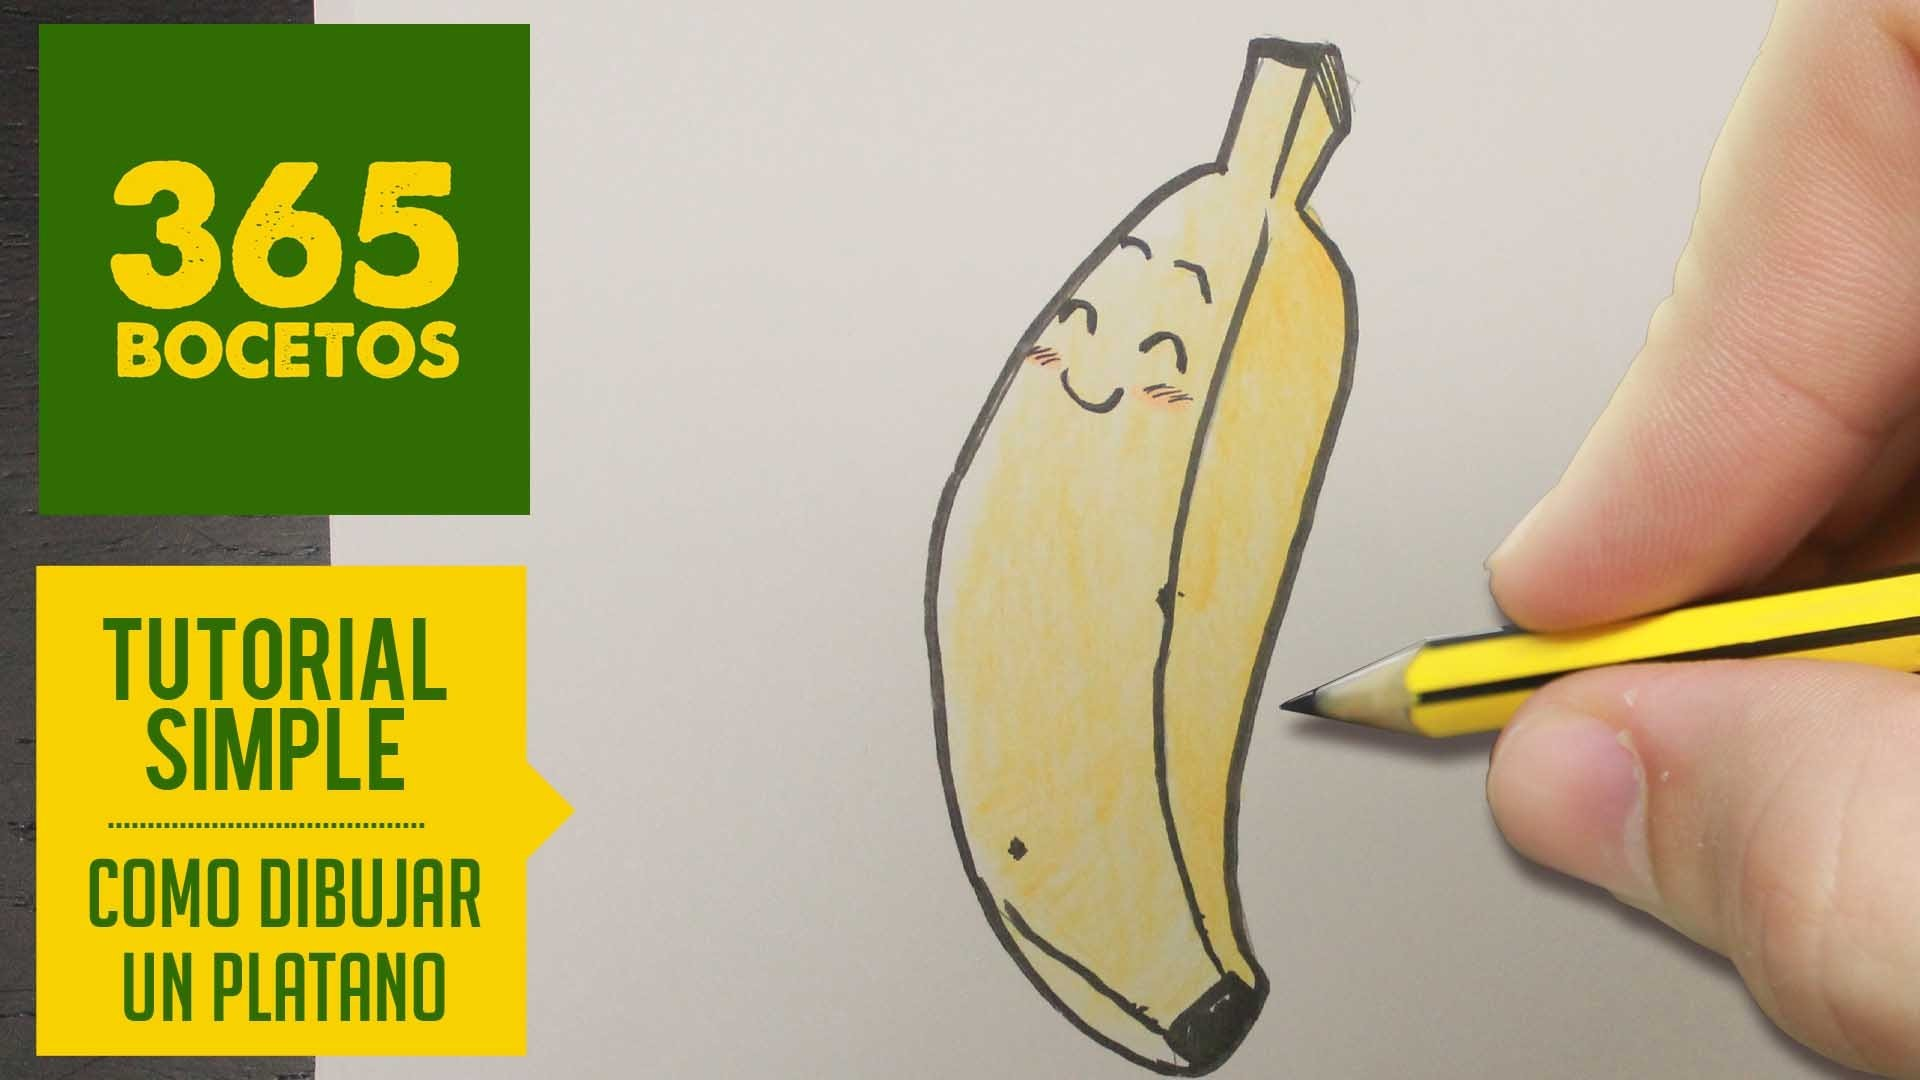 COMO DIBUJAR UN PLATANO KAWAII PASO A PASO - Dibujos kawaii faciles - How to draw a banana